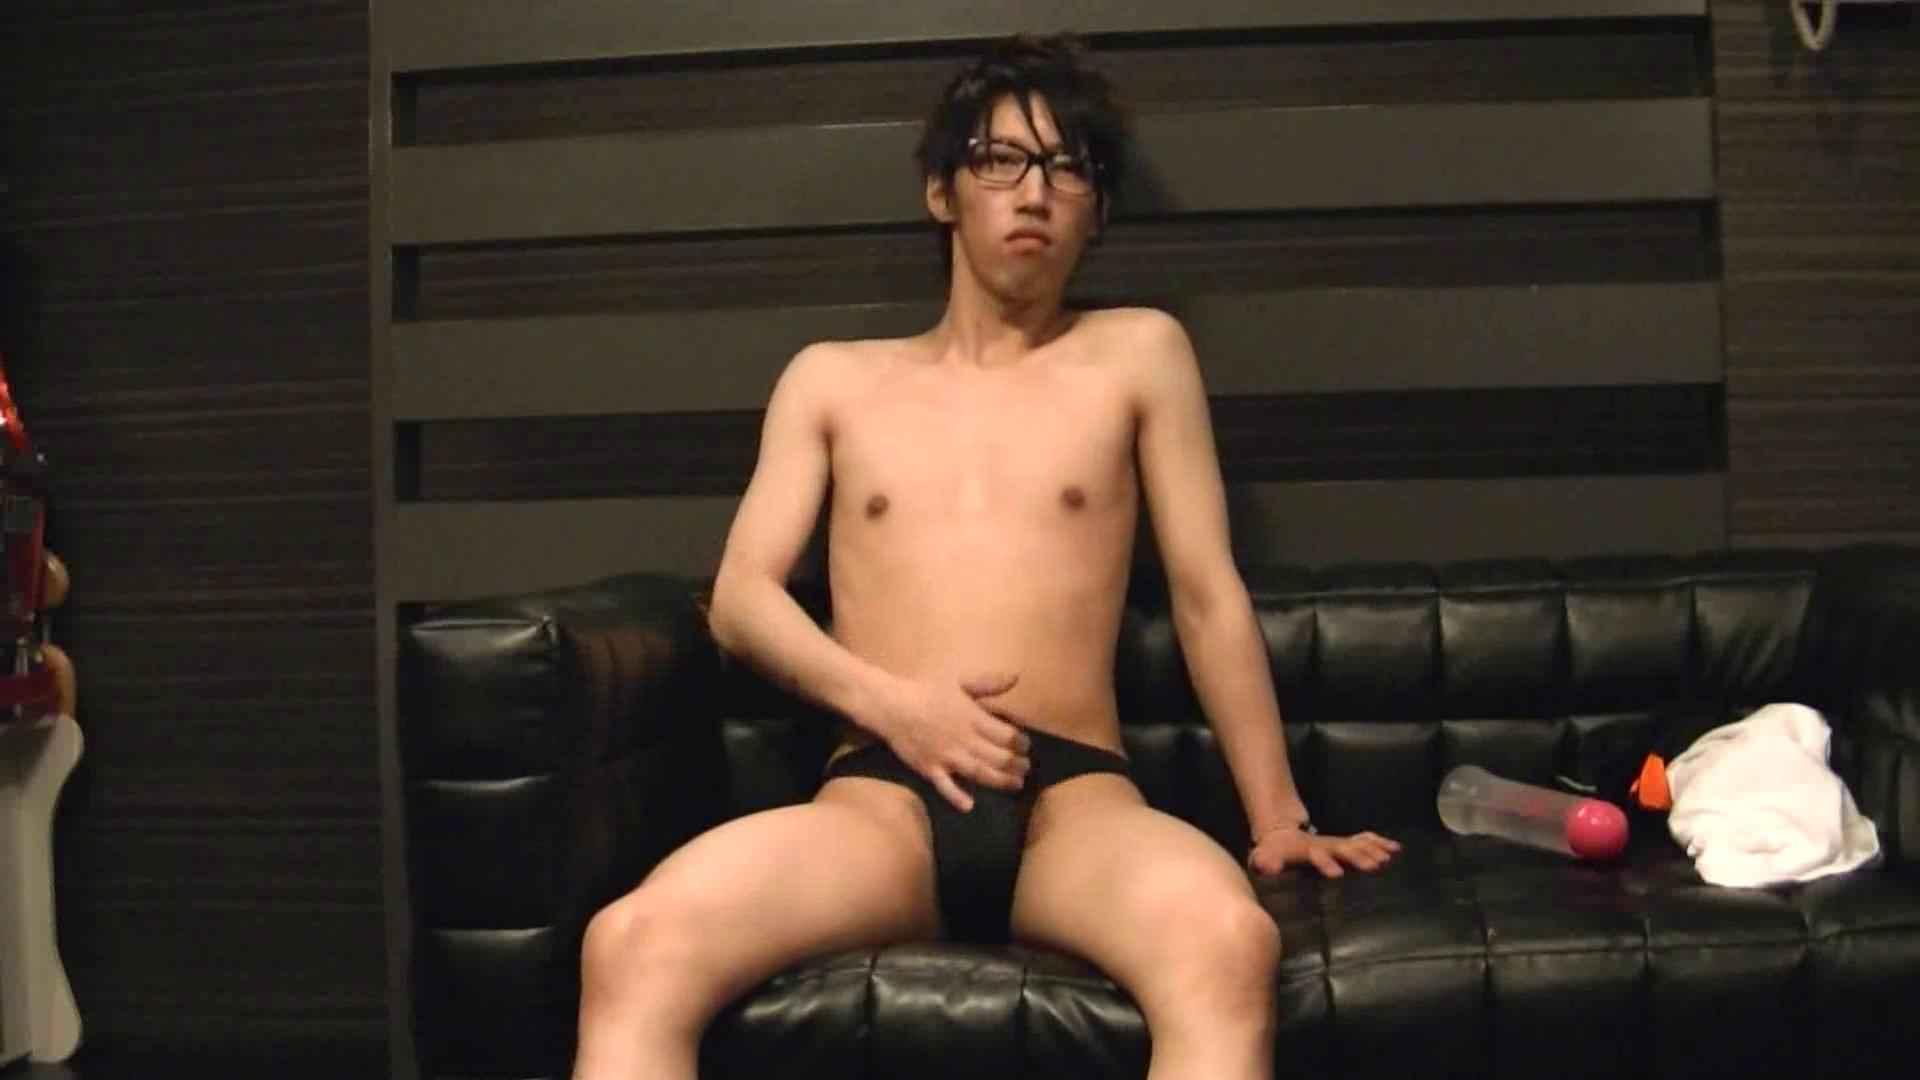 ONA見せカーニバル!! Vol3 男  93pic 23